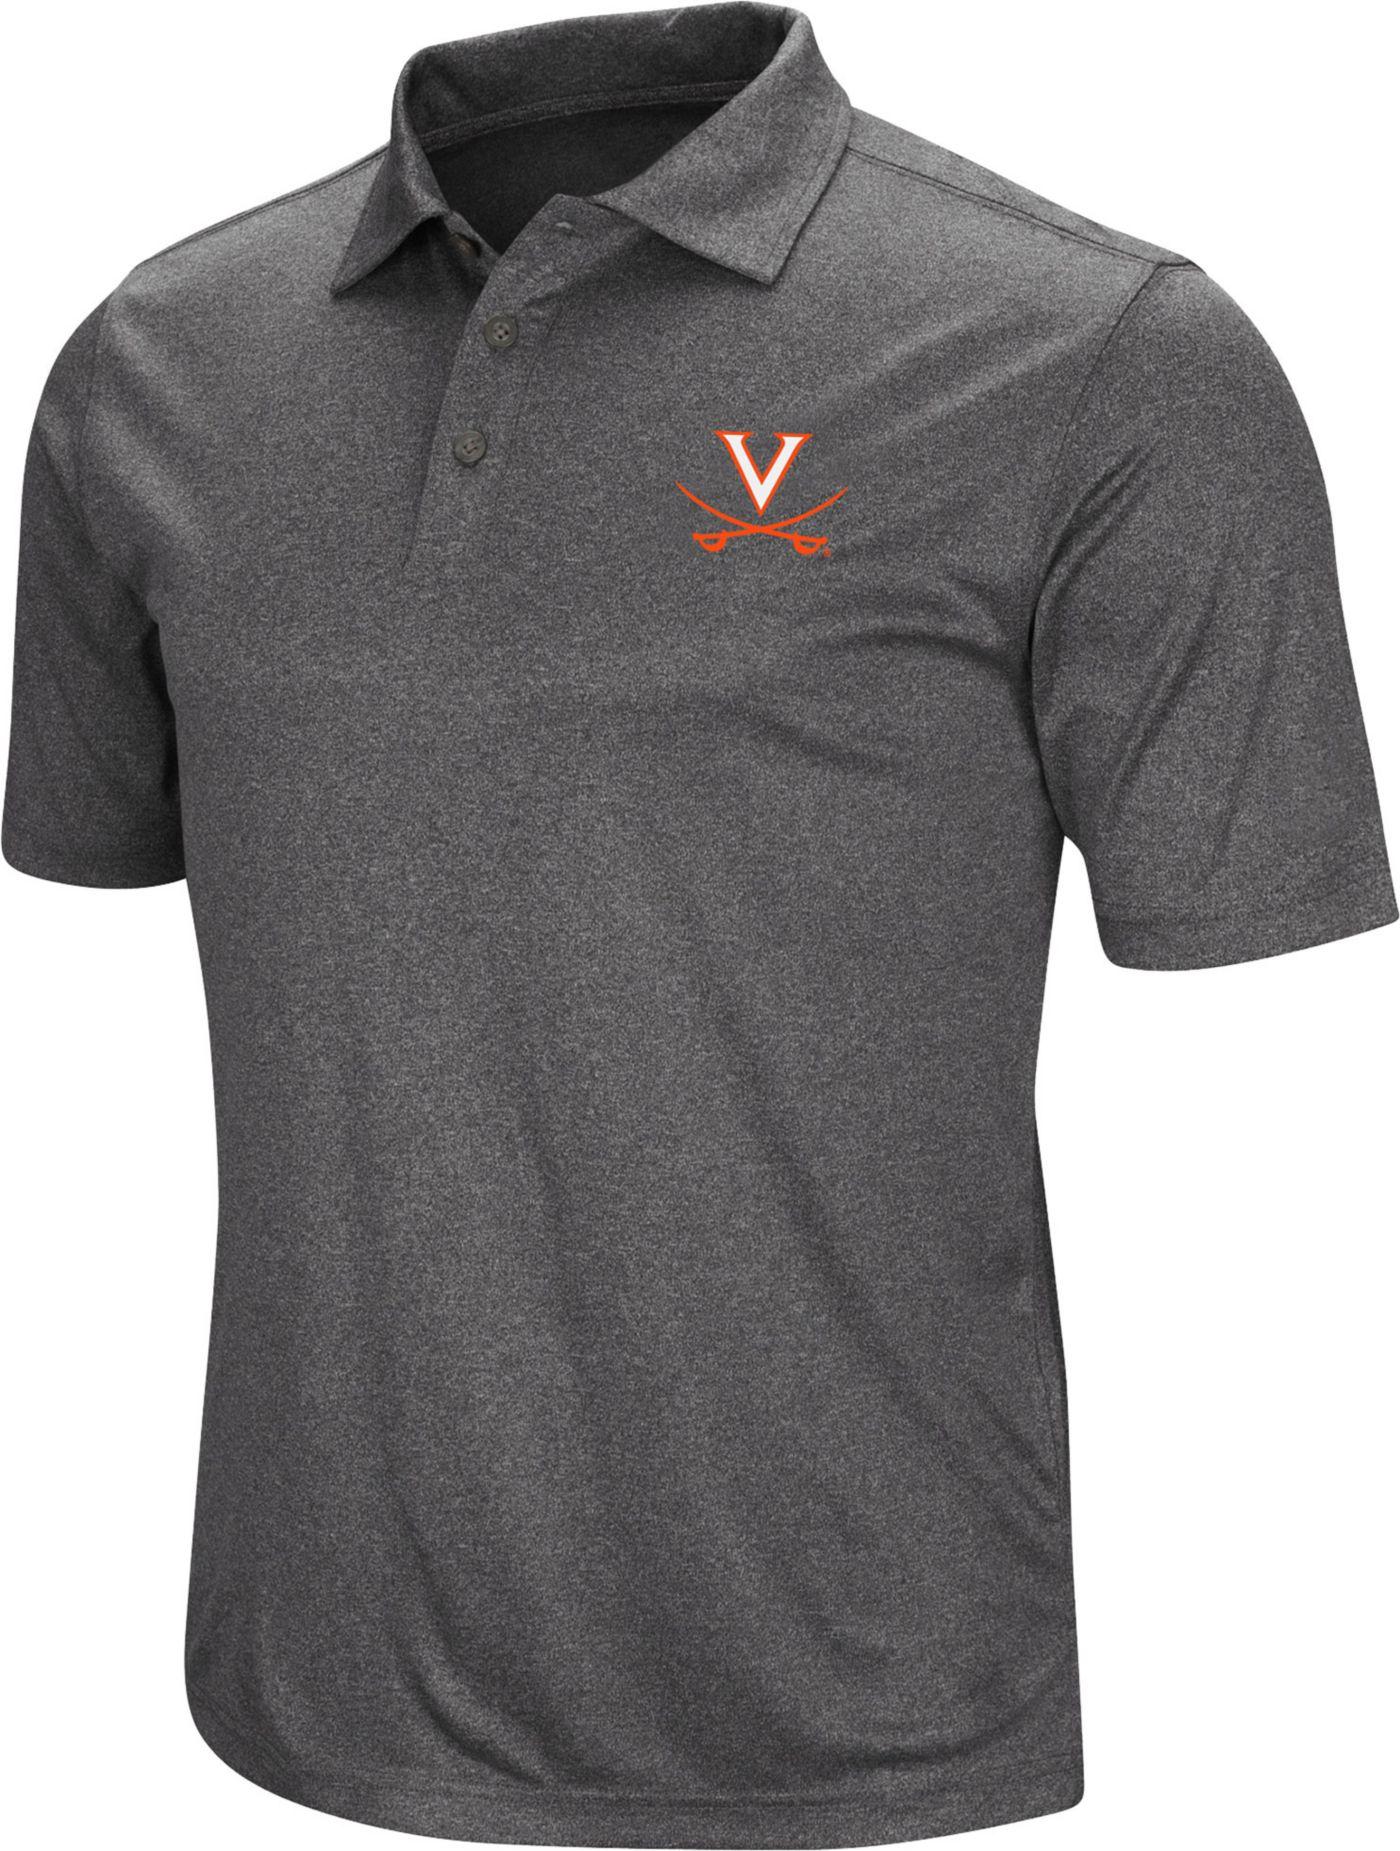 Colosseum Men's Virginia Cavaliers Grey Polo